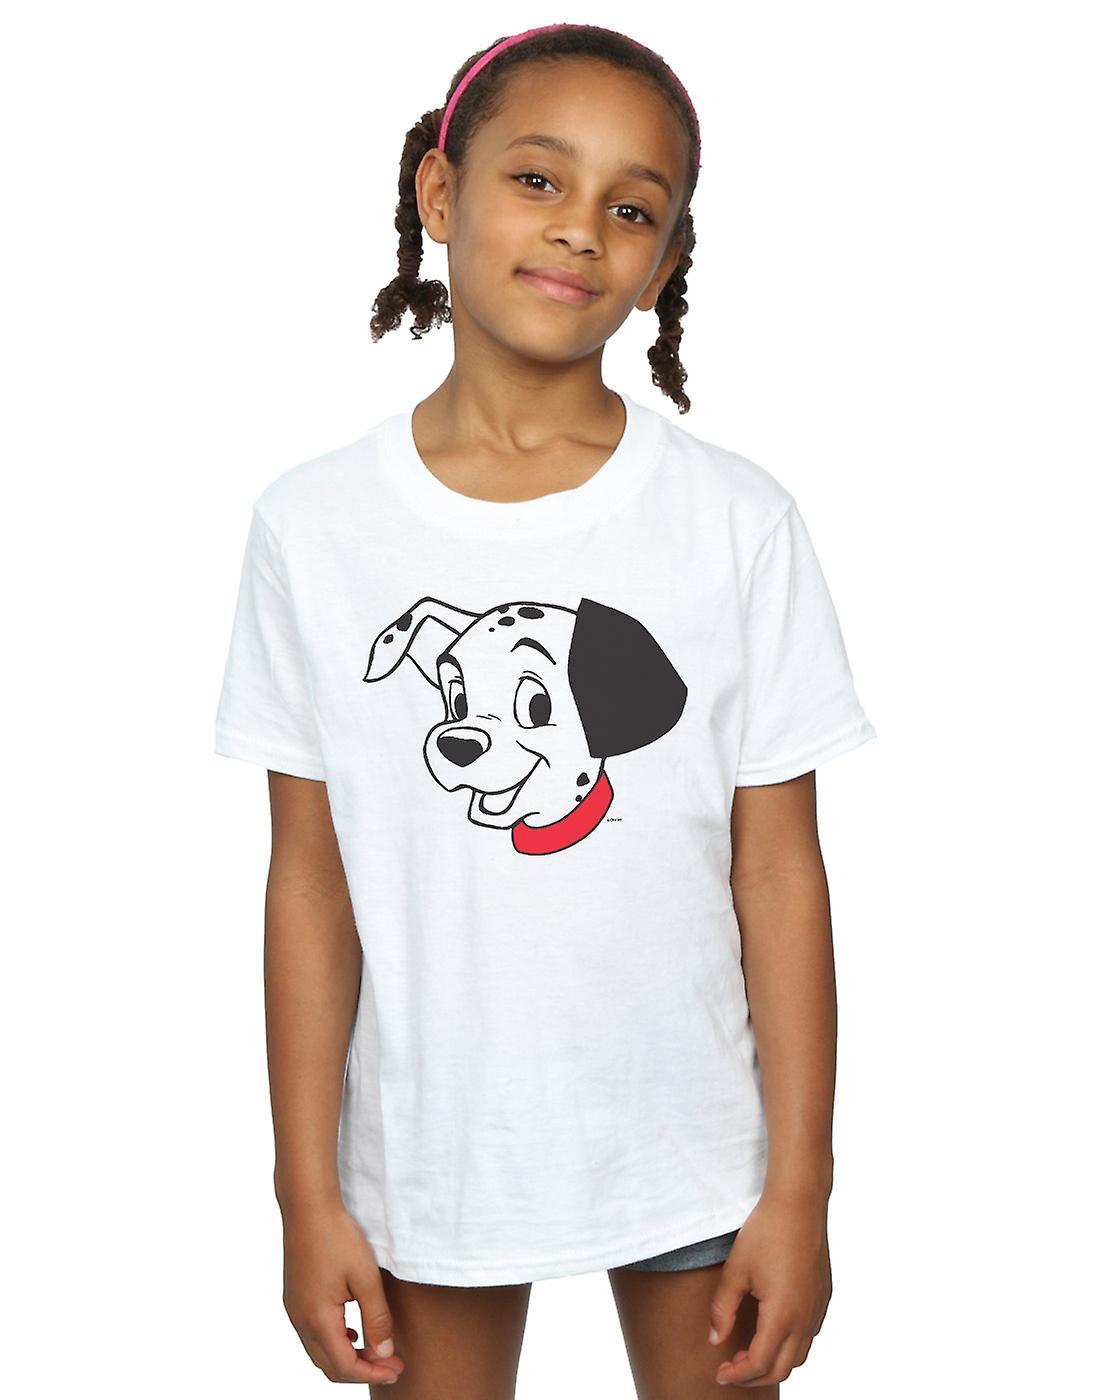 Disney Girls 101 Dalmatians Dalmatian Head T-Shirt